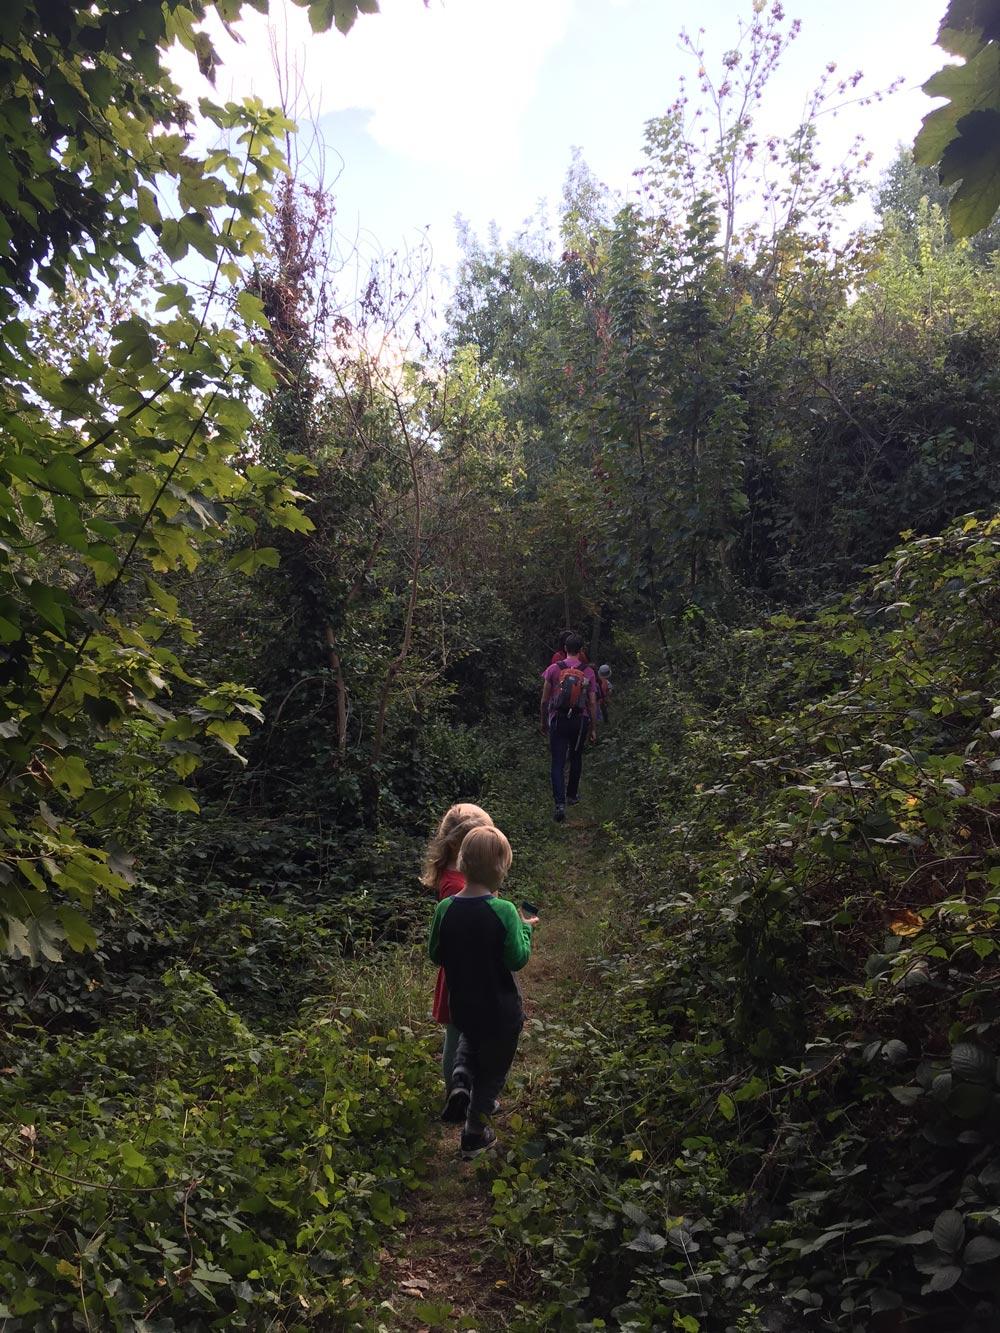 brockley-nature-blog-post-hana-2016